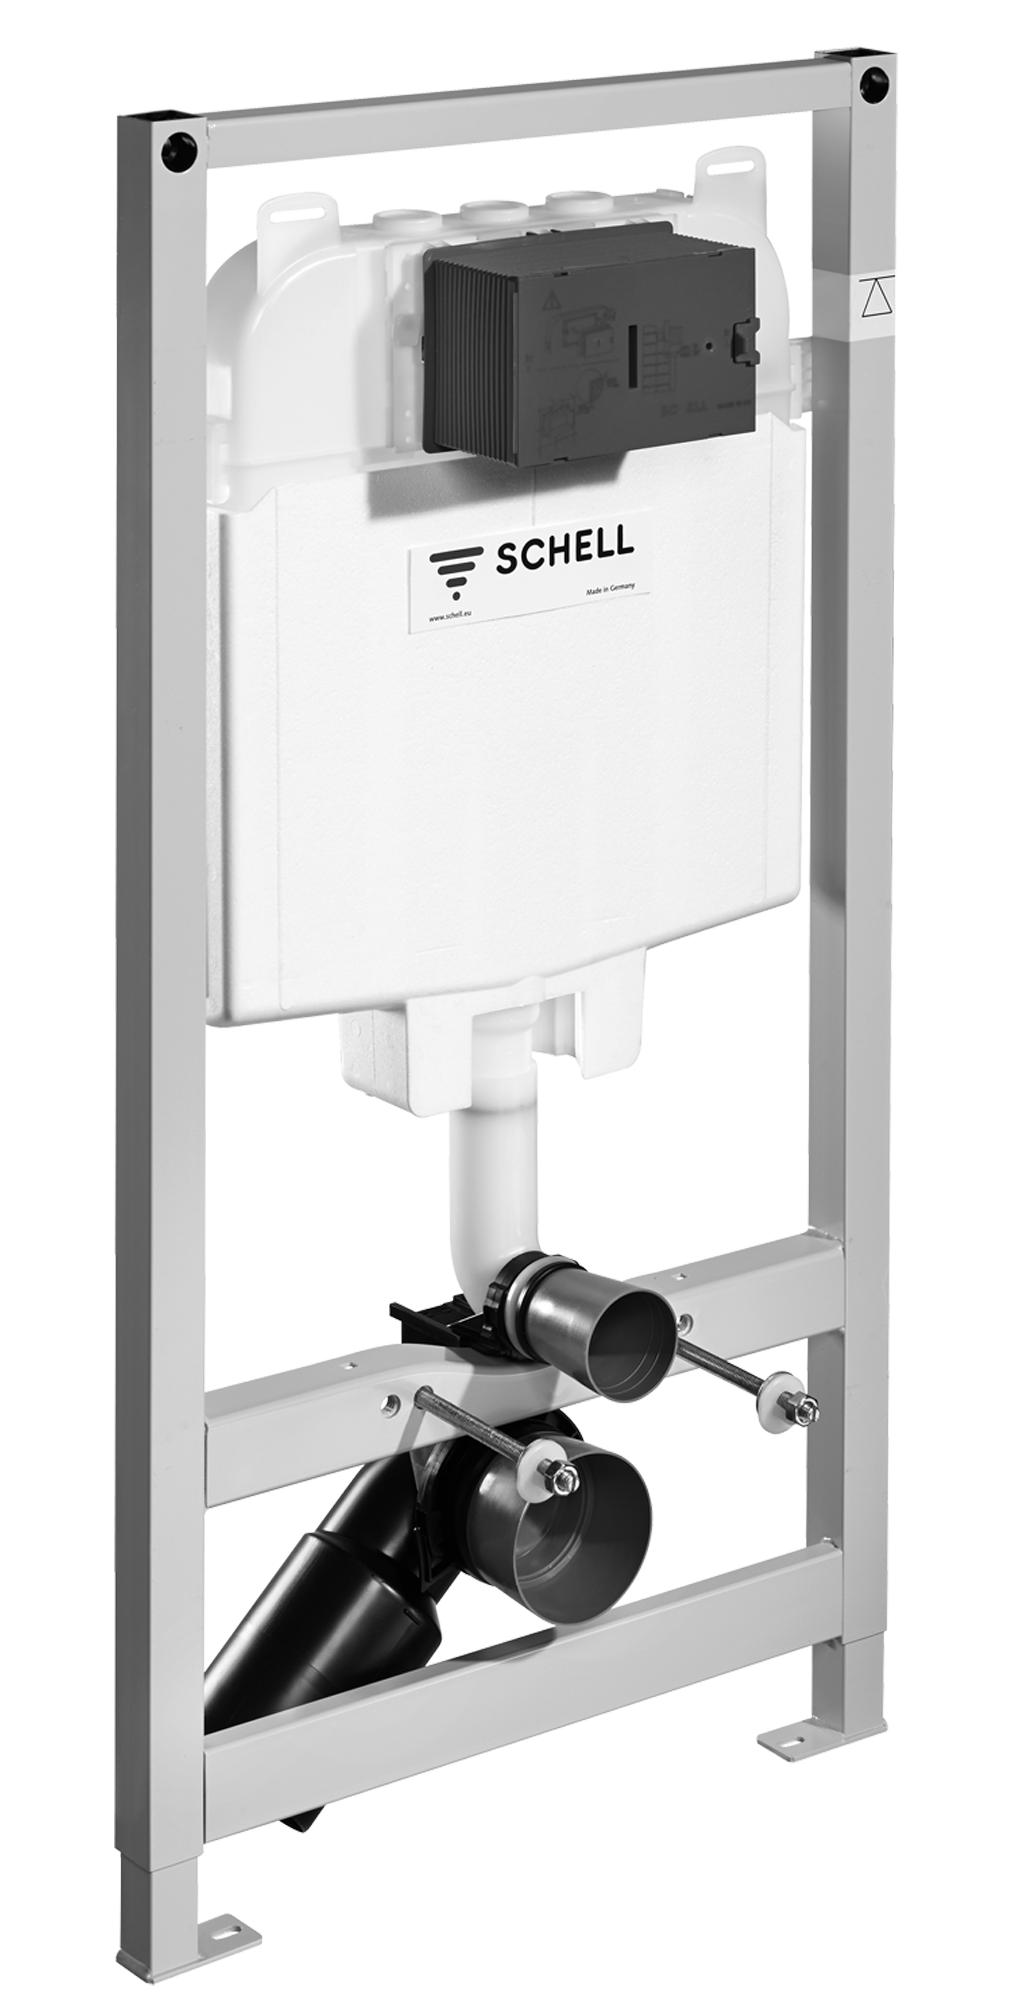 Структура за вграждане Montus C80 с бутон Linear II хром, Schell